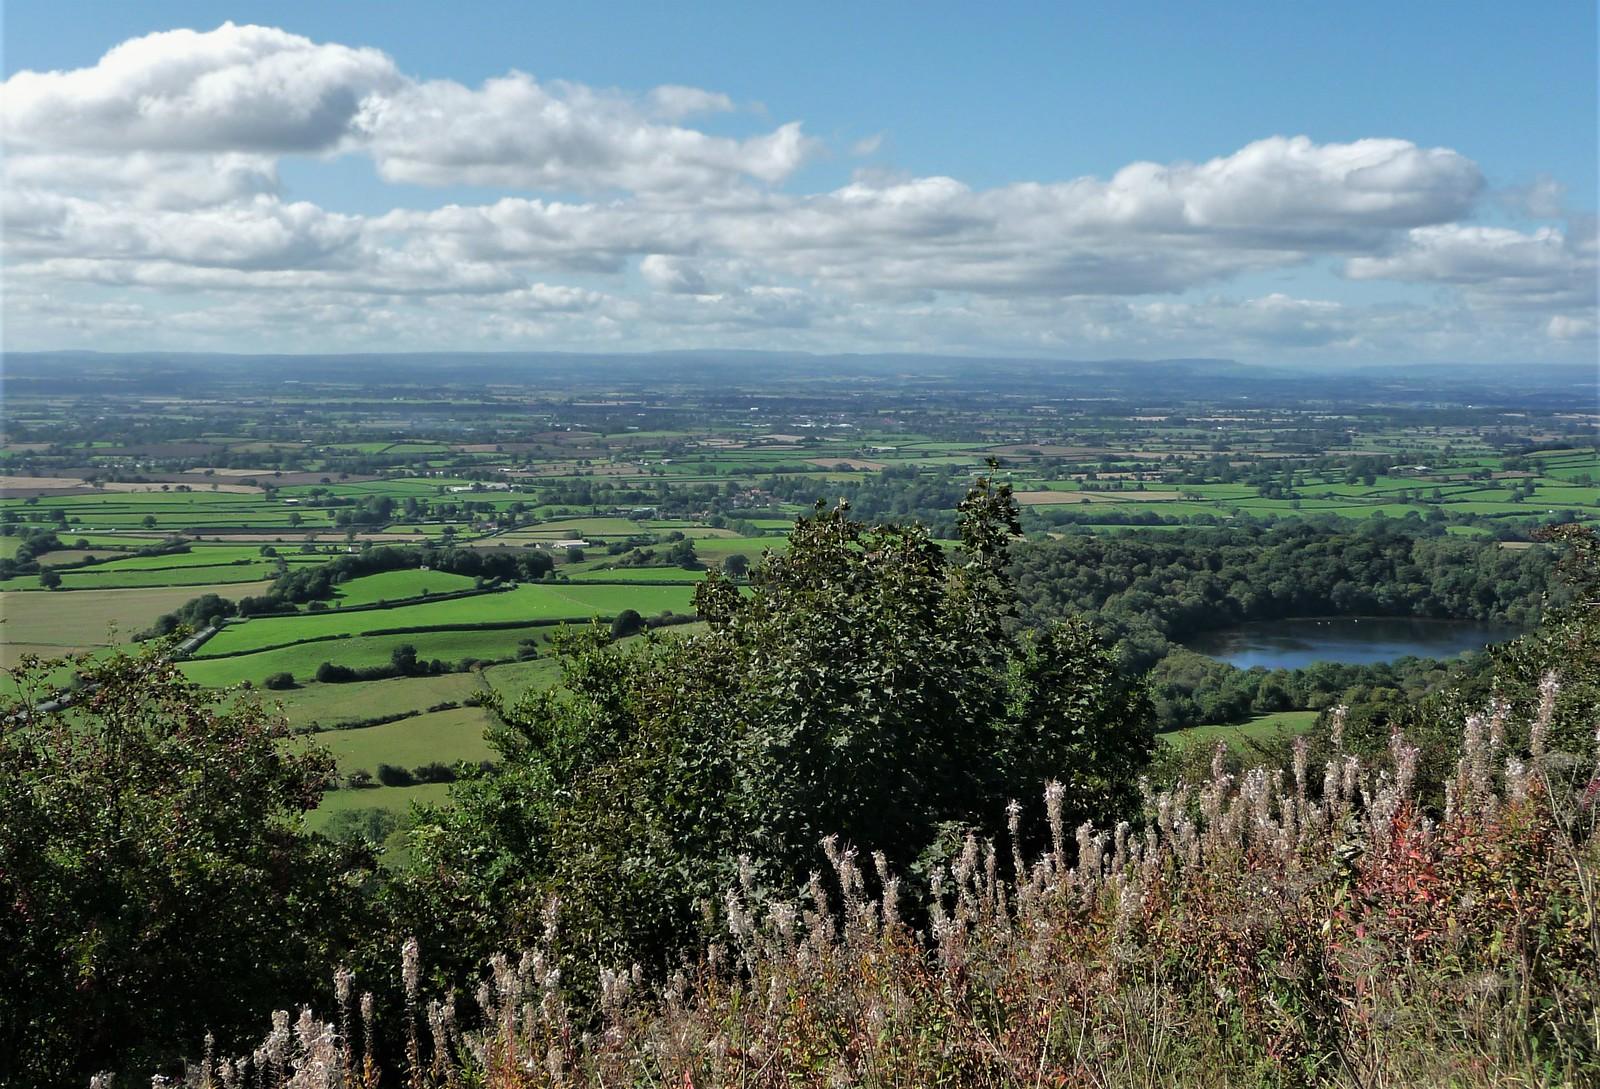 View from Sutton Bank, Panasonic DMC-TZ4